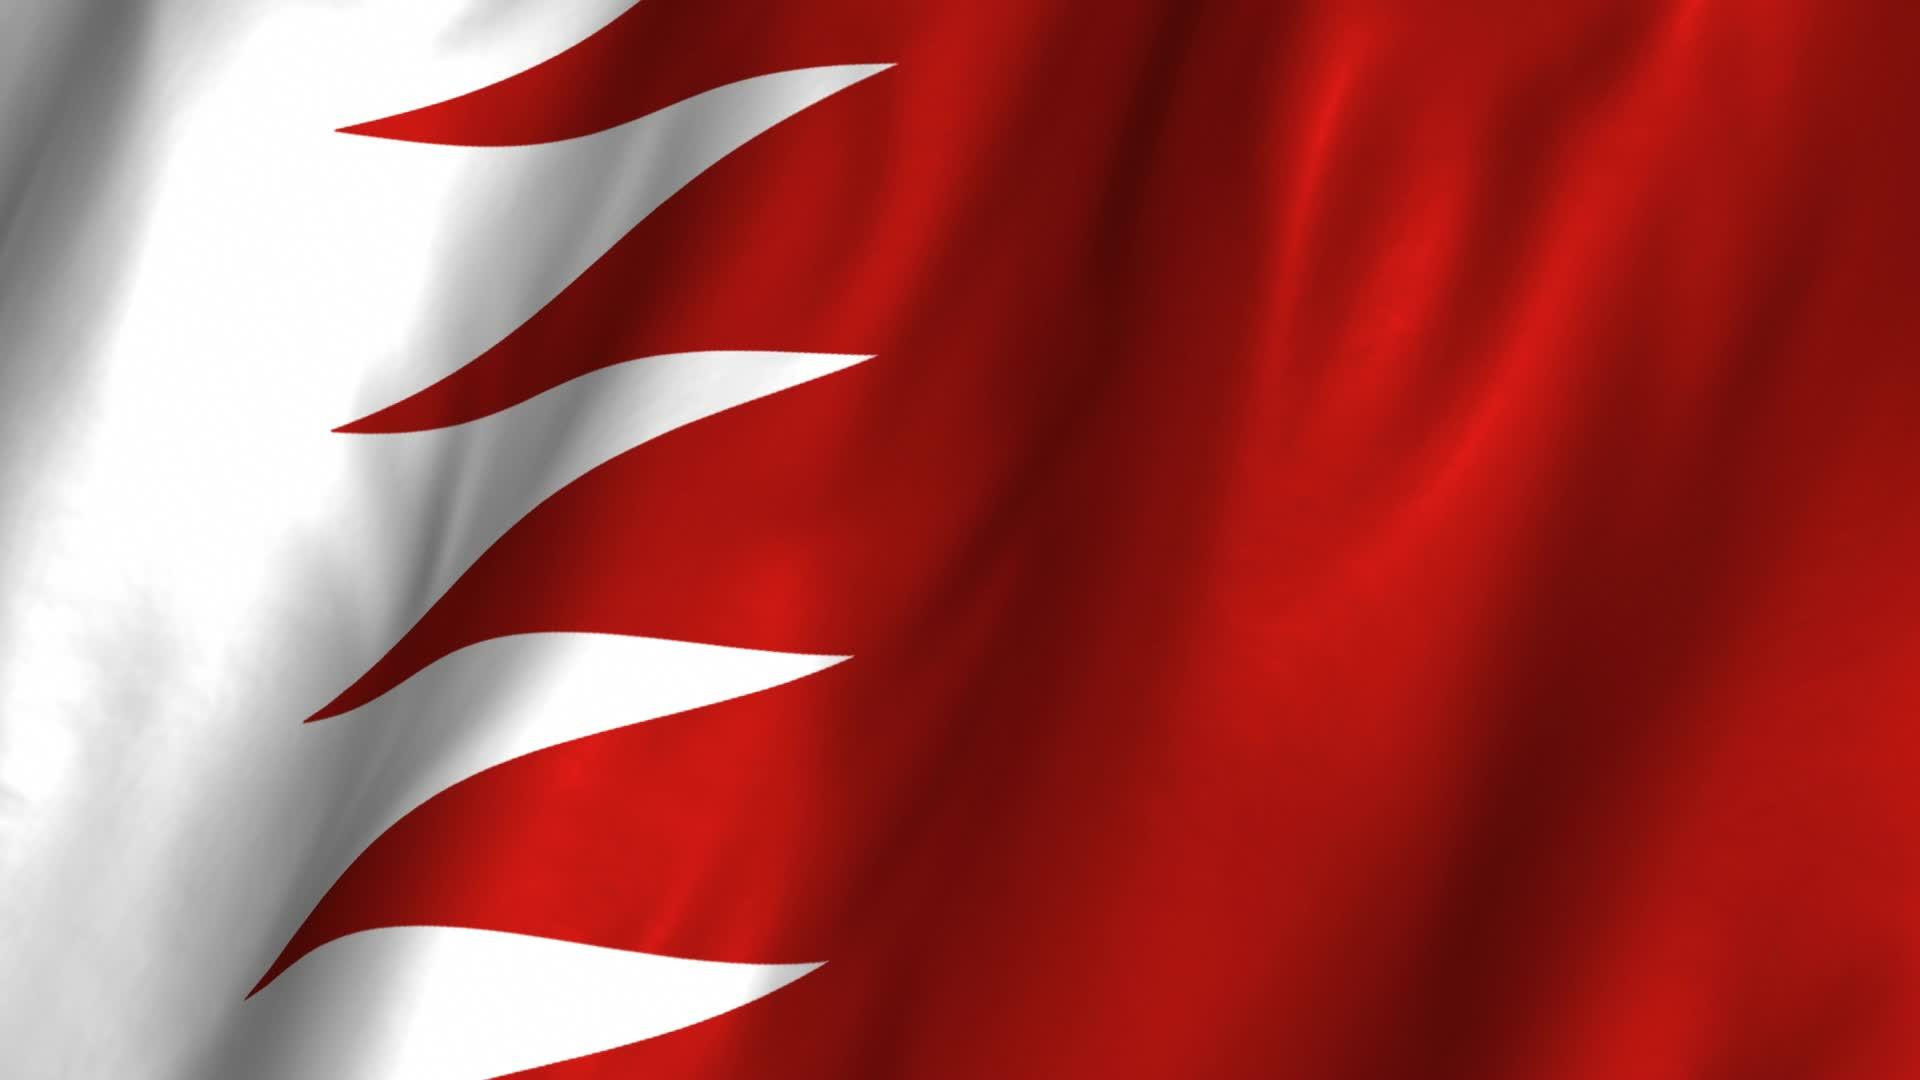 Flag Of Bahrain The Symbol Of Strength - Bahrain flags